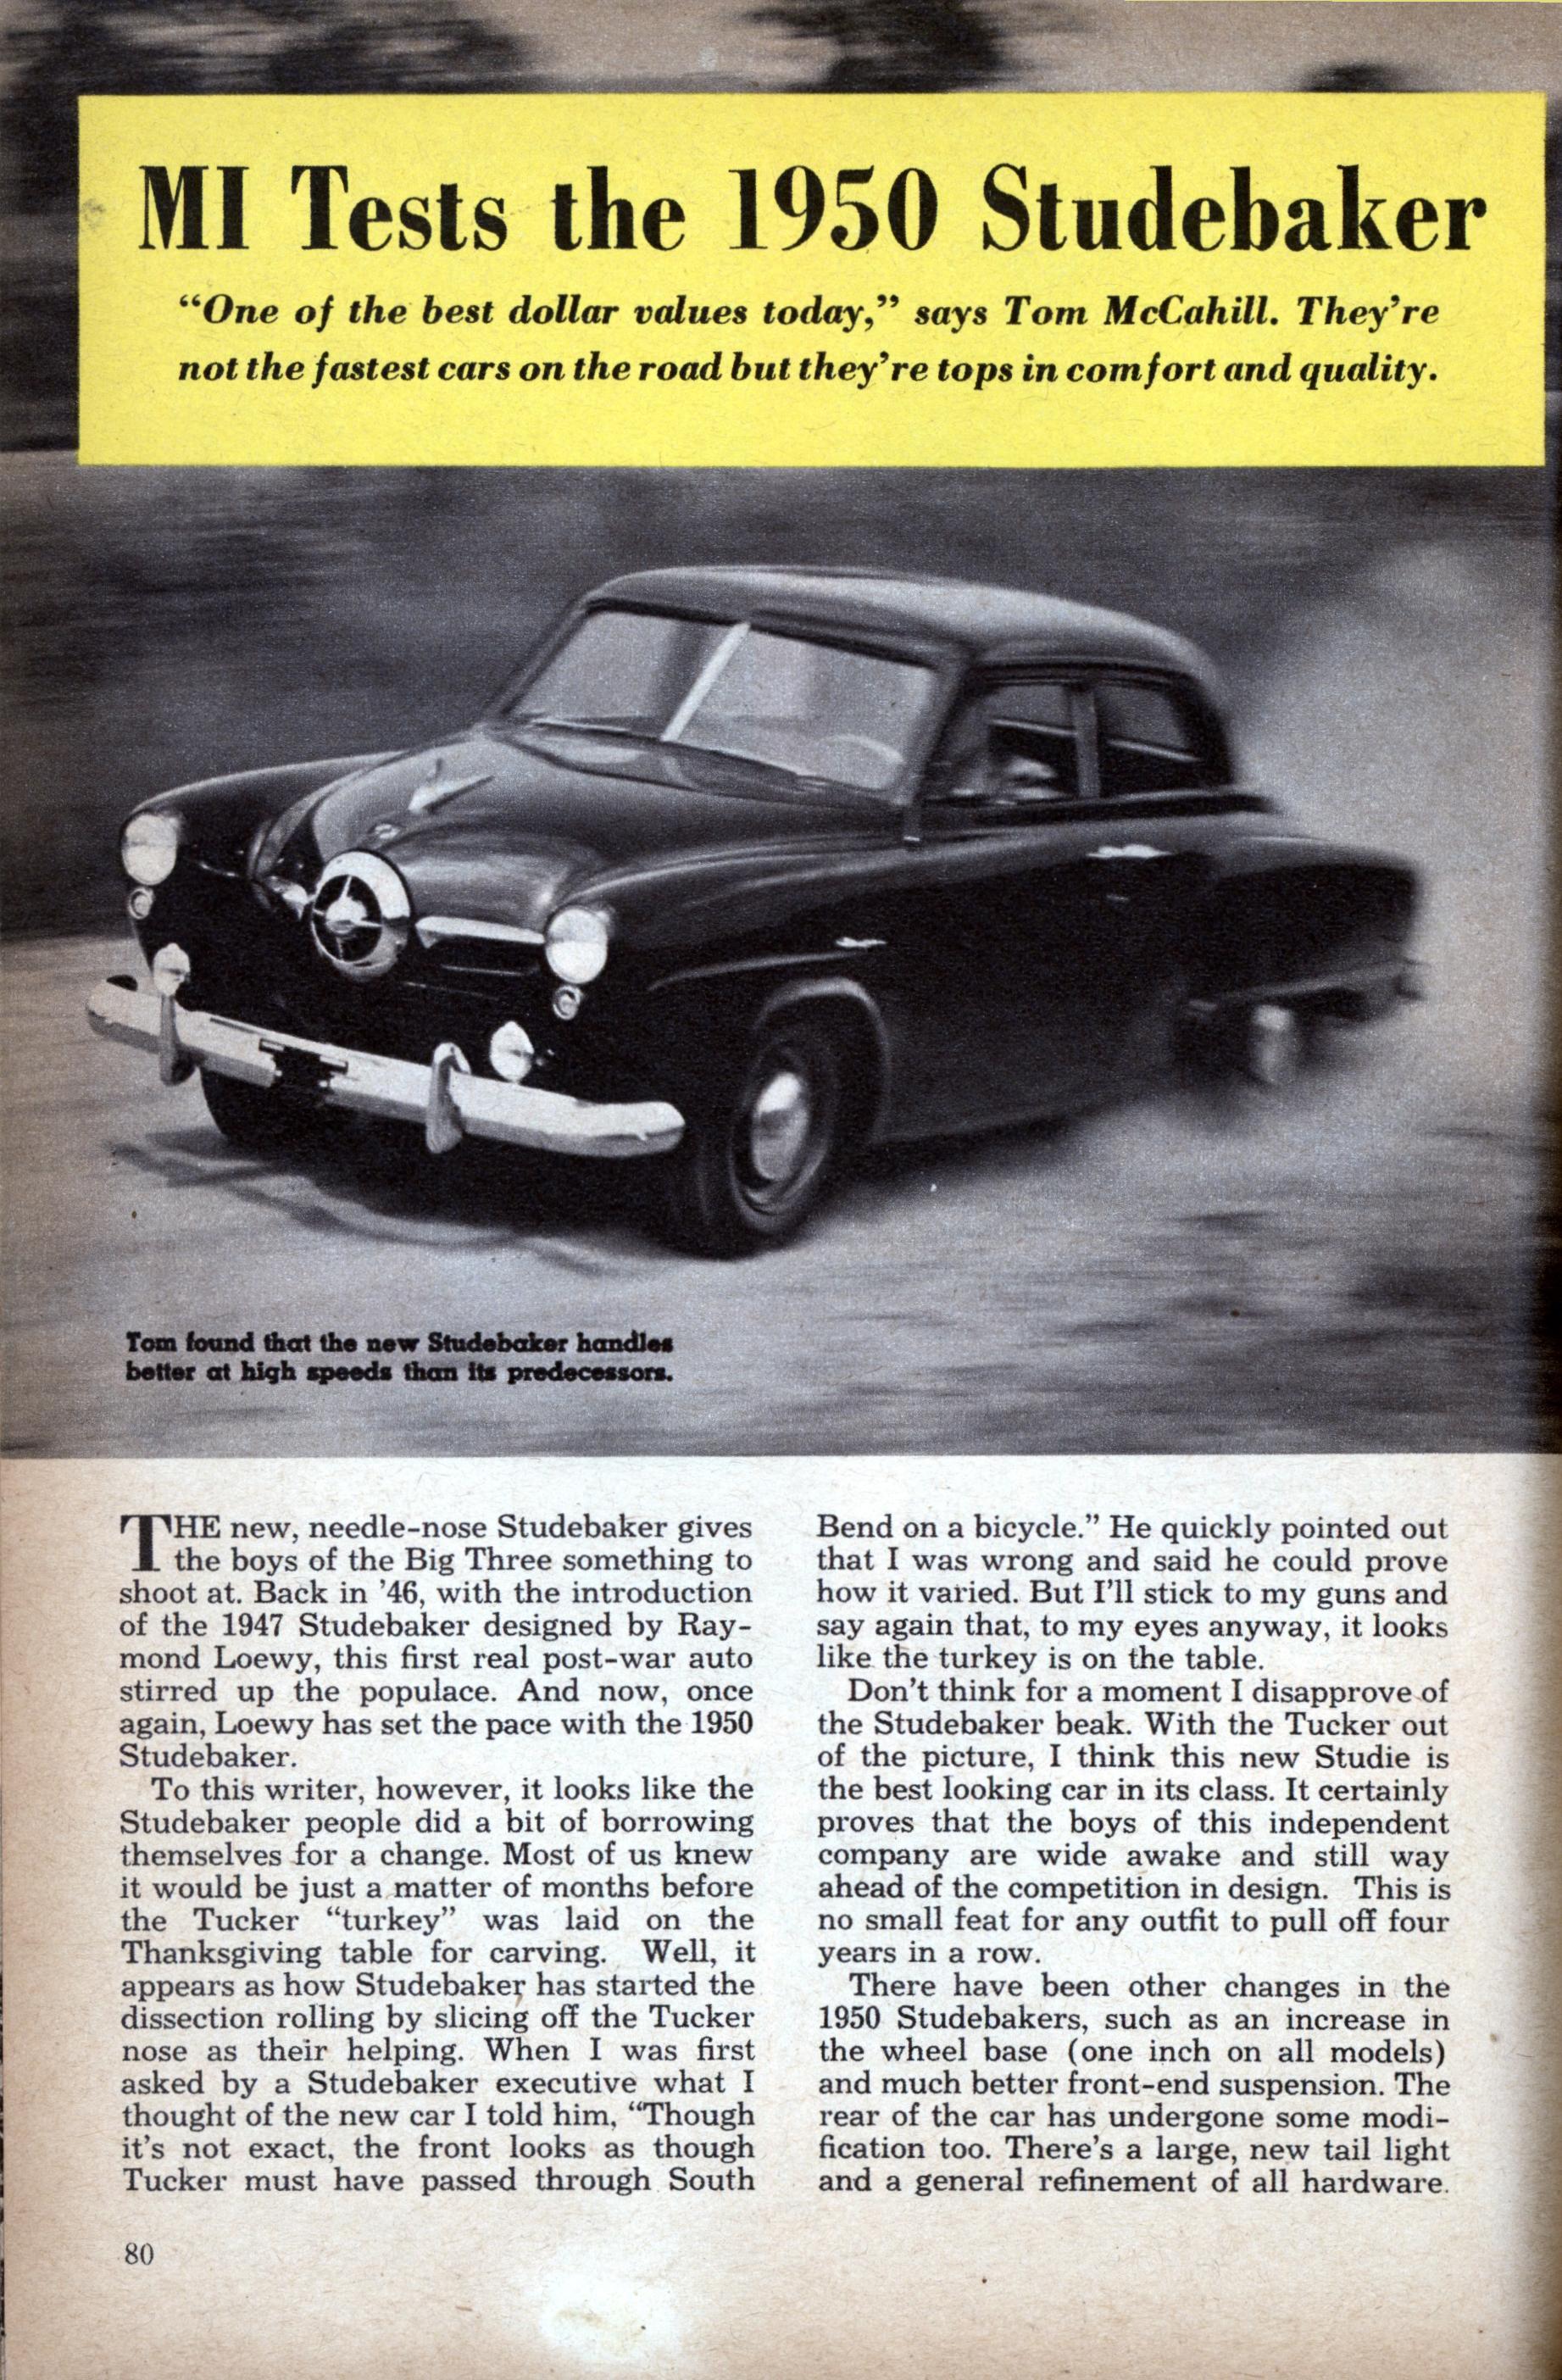 MI Tests the 1950 Studebaker